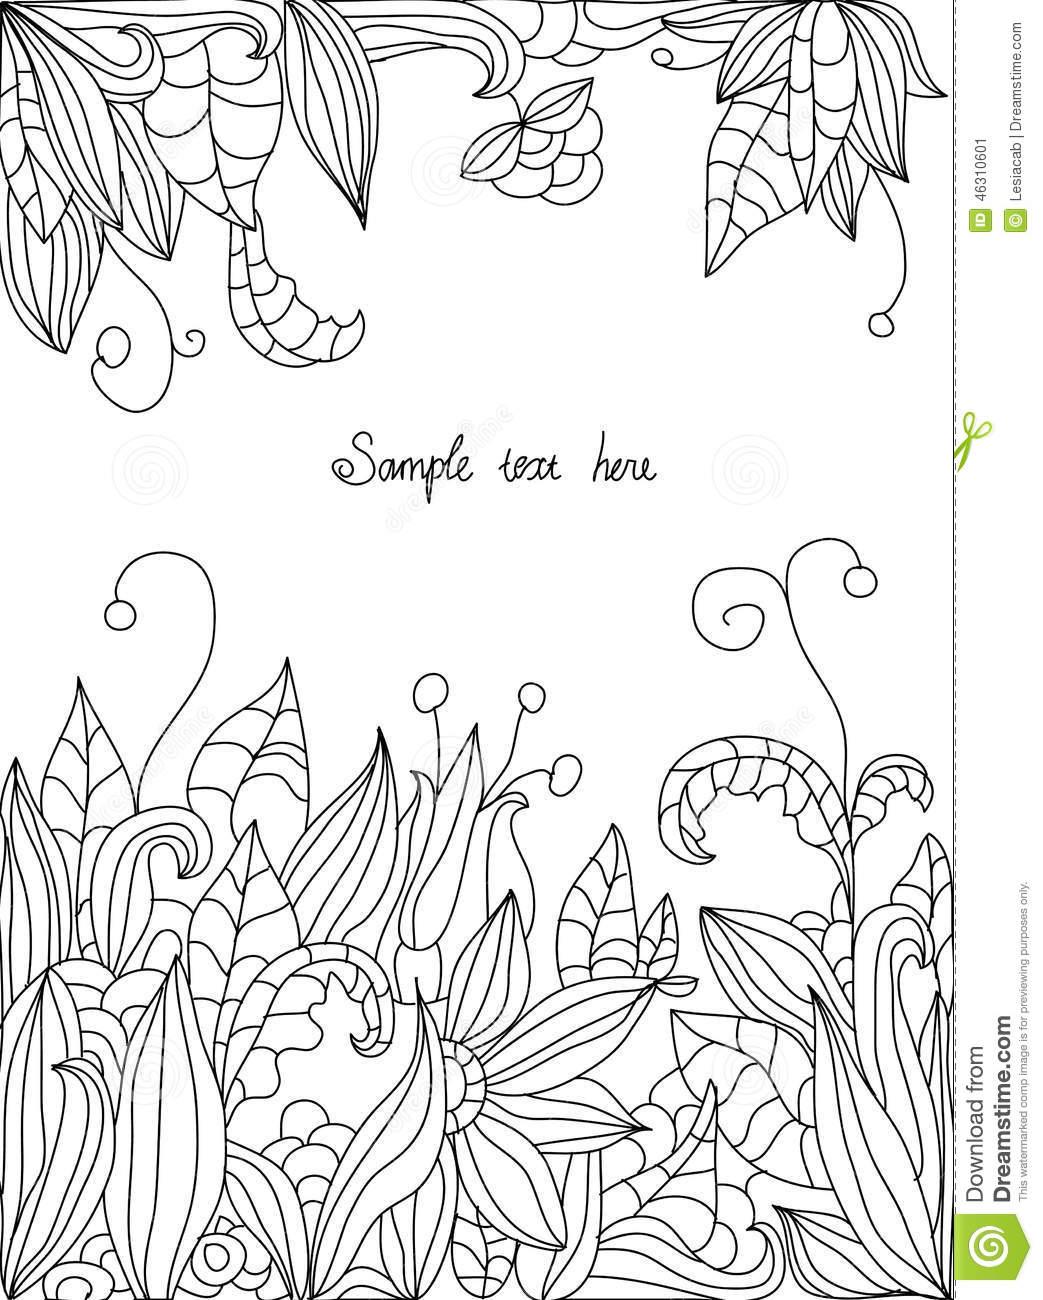 Desenho Folhas Related Keywords & Suggestions